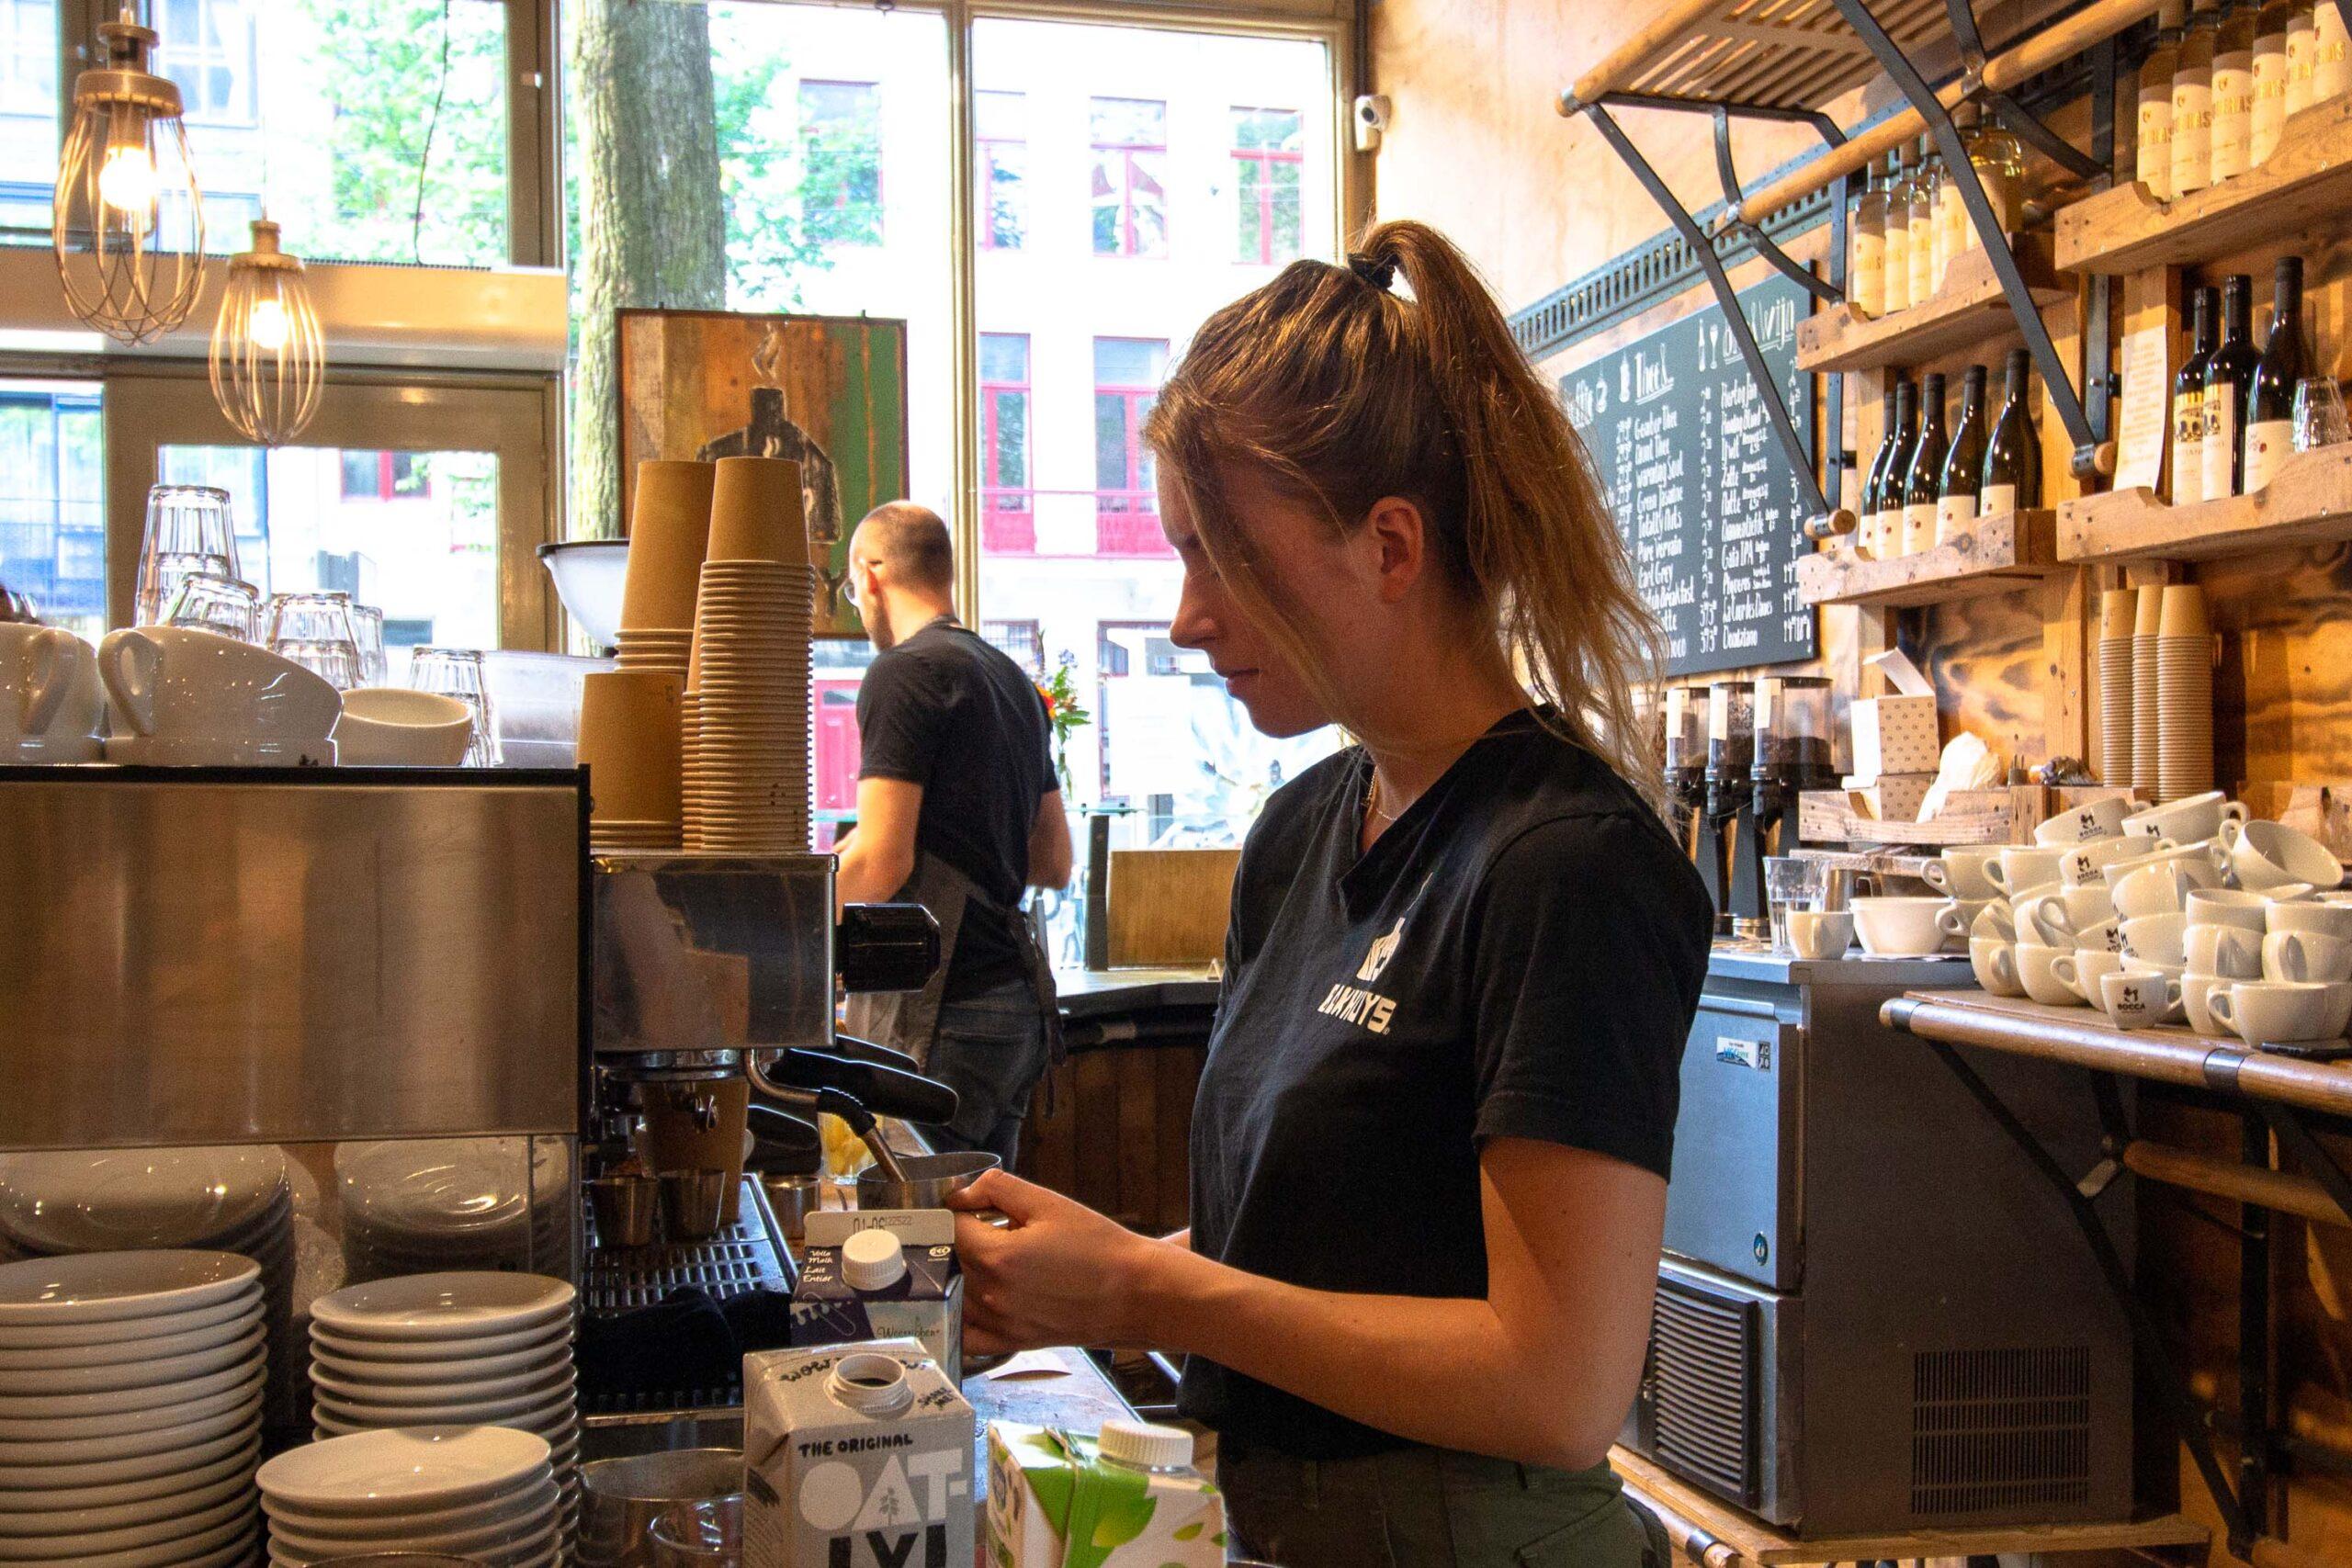 Bakhuys barista